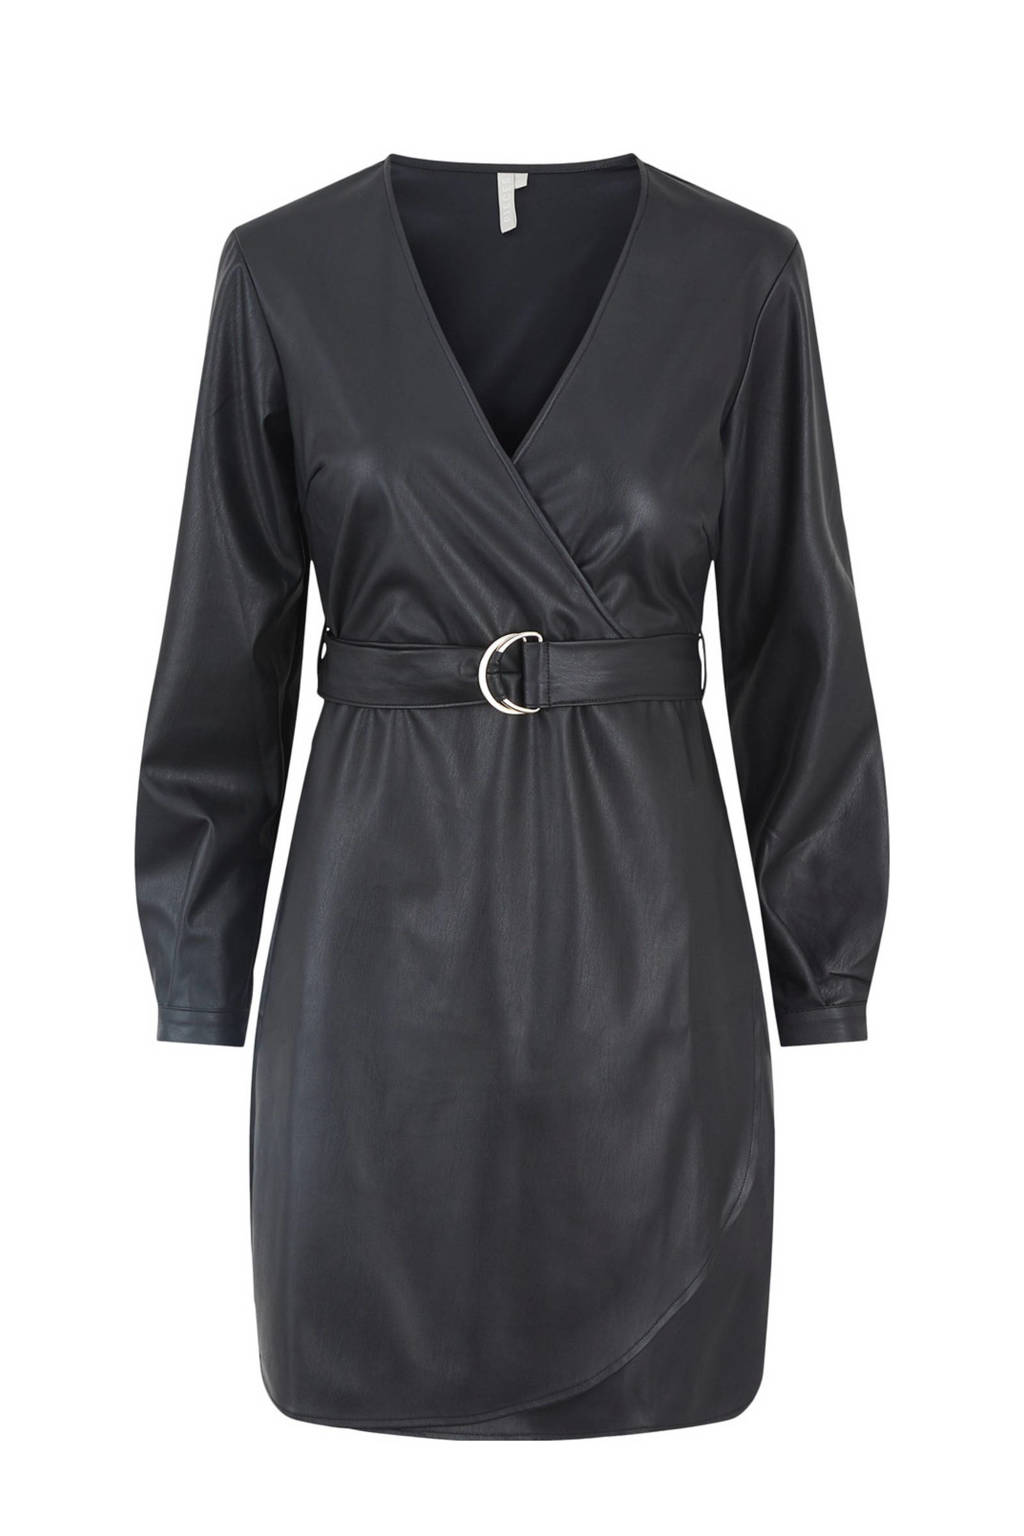 PIECES jurk PCKIMMI zwart, Zwart